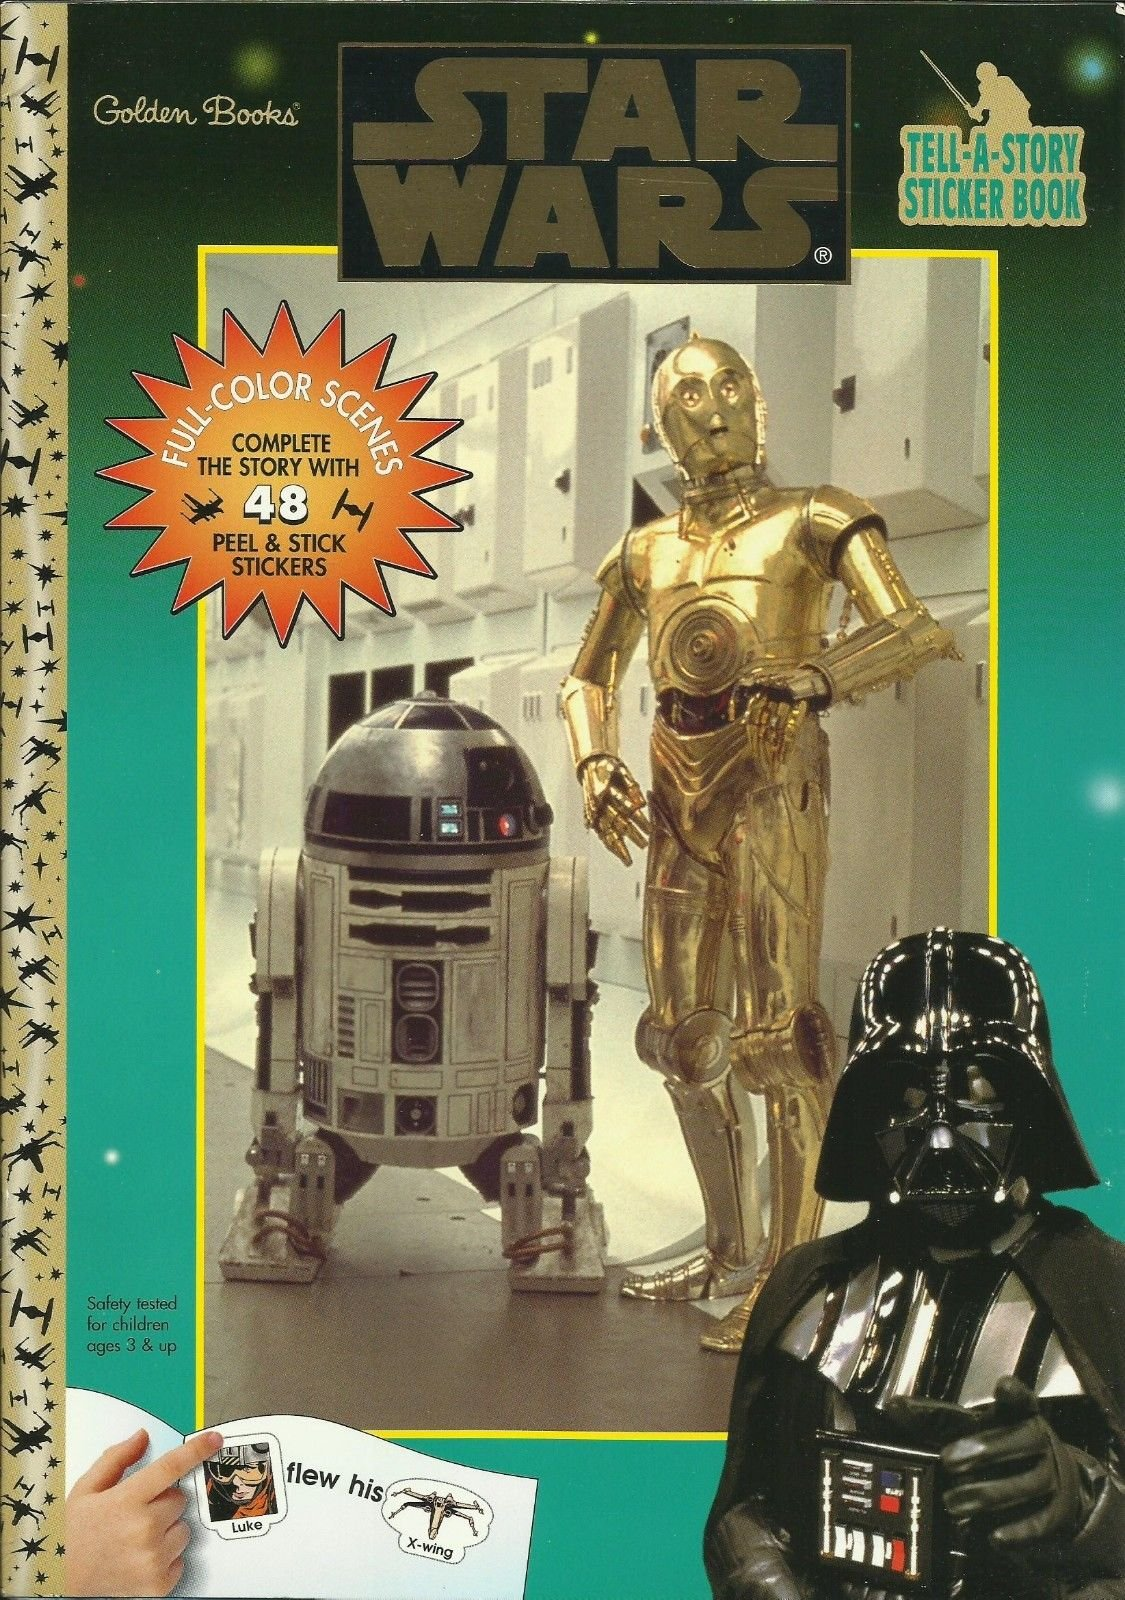 Star Wars Tell-a-Story Sticker Book